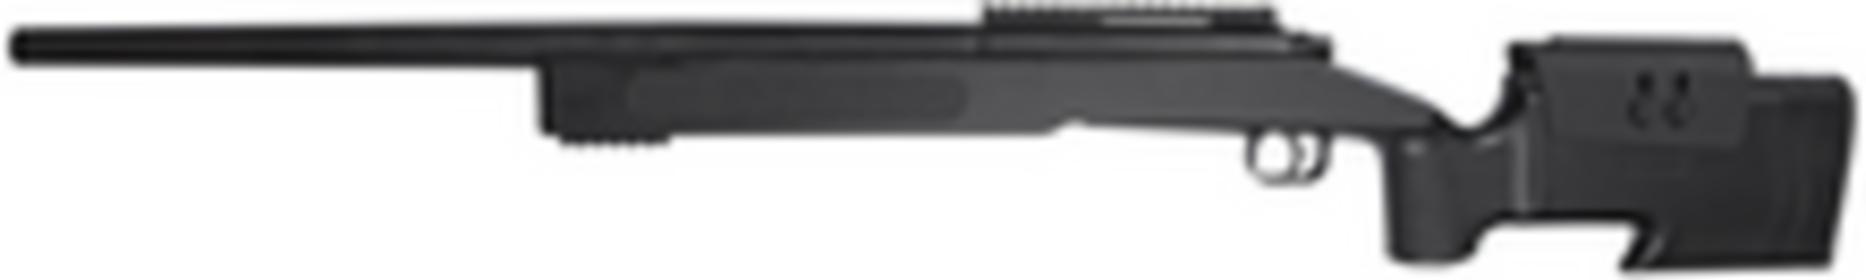 Action Sport GamesKarabin snajperski ASG M40A3 McMillan - zestaw (18556)